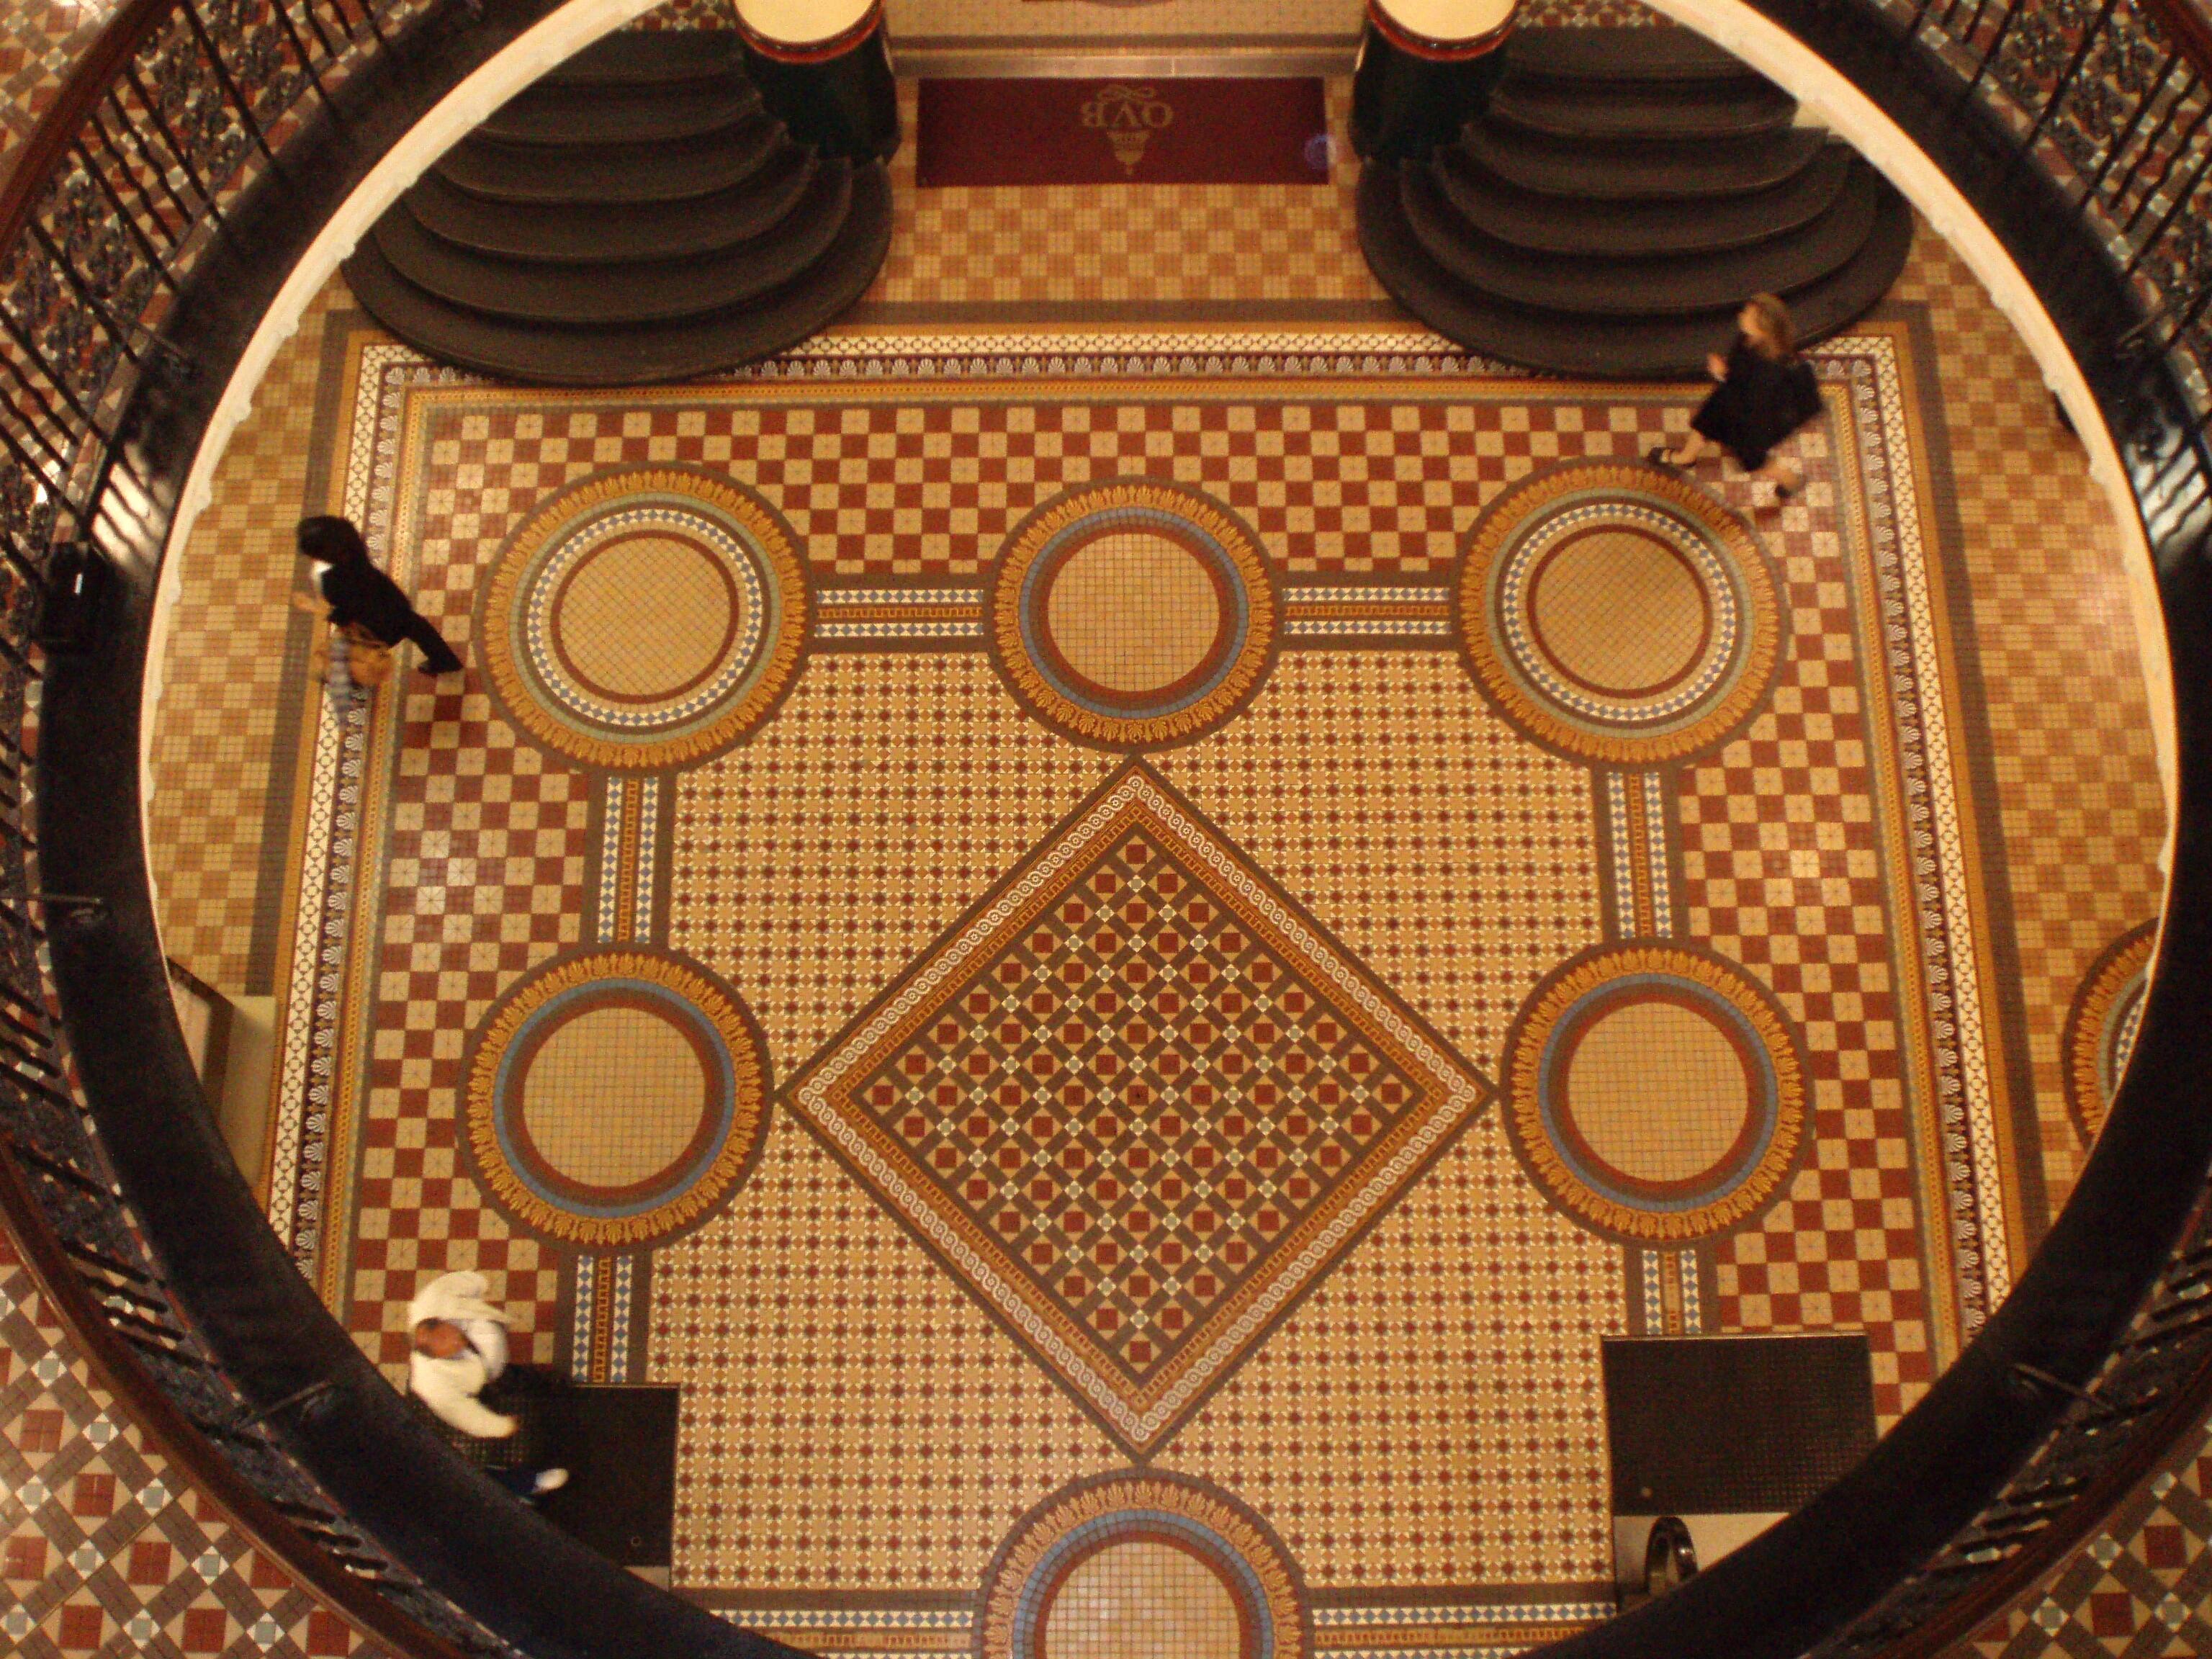 Mosaic Tile Patterns For Floors Floor Tiles Mosaic Small